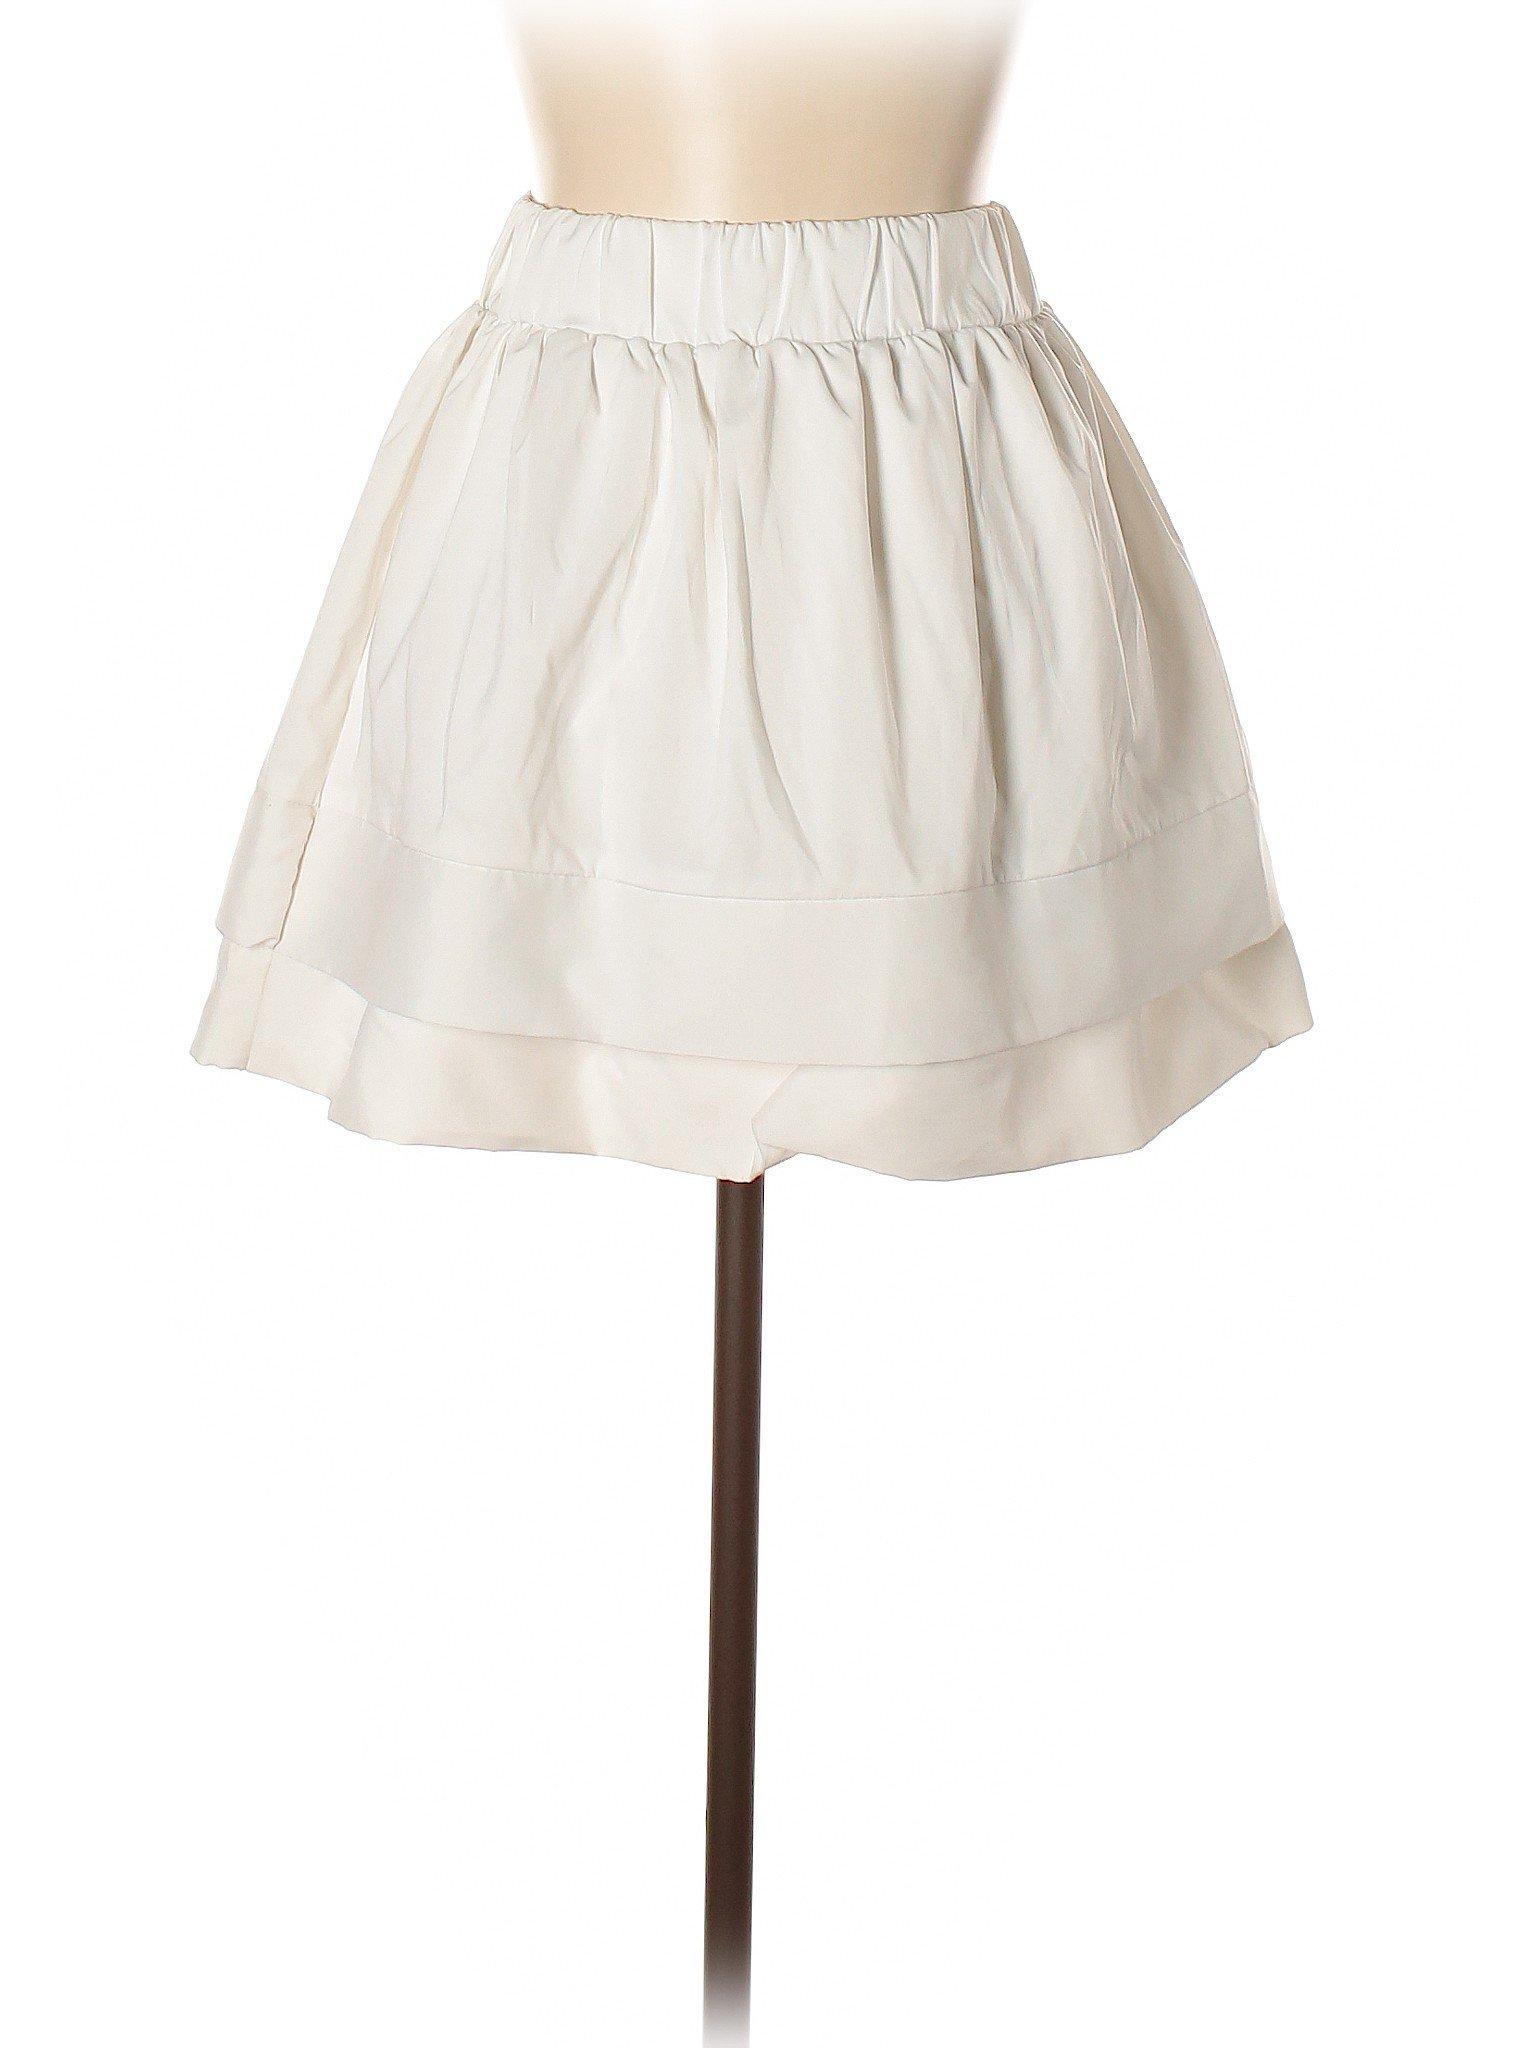 Casual Casual Skirt Boutique Skirt Boutique Boutique Casual Skirt Casual Skirt Boutique dxEYSdnqw